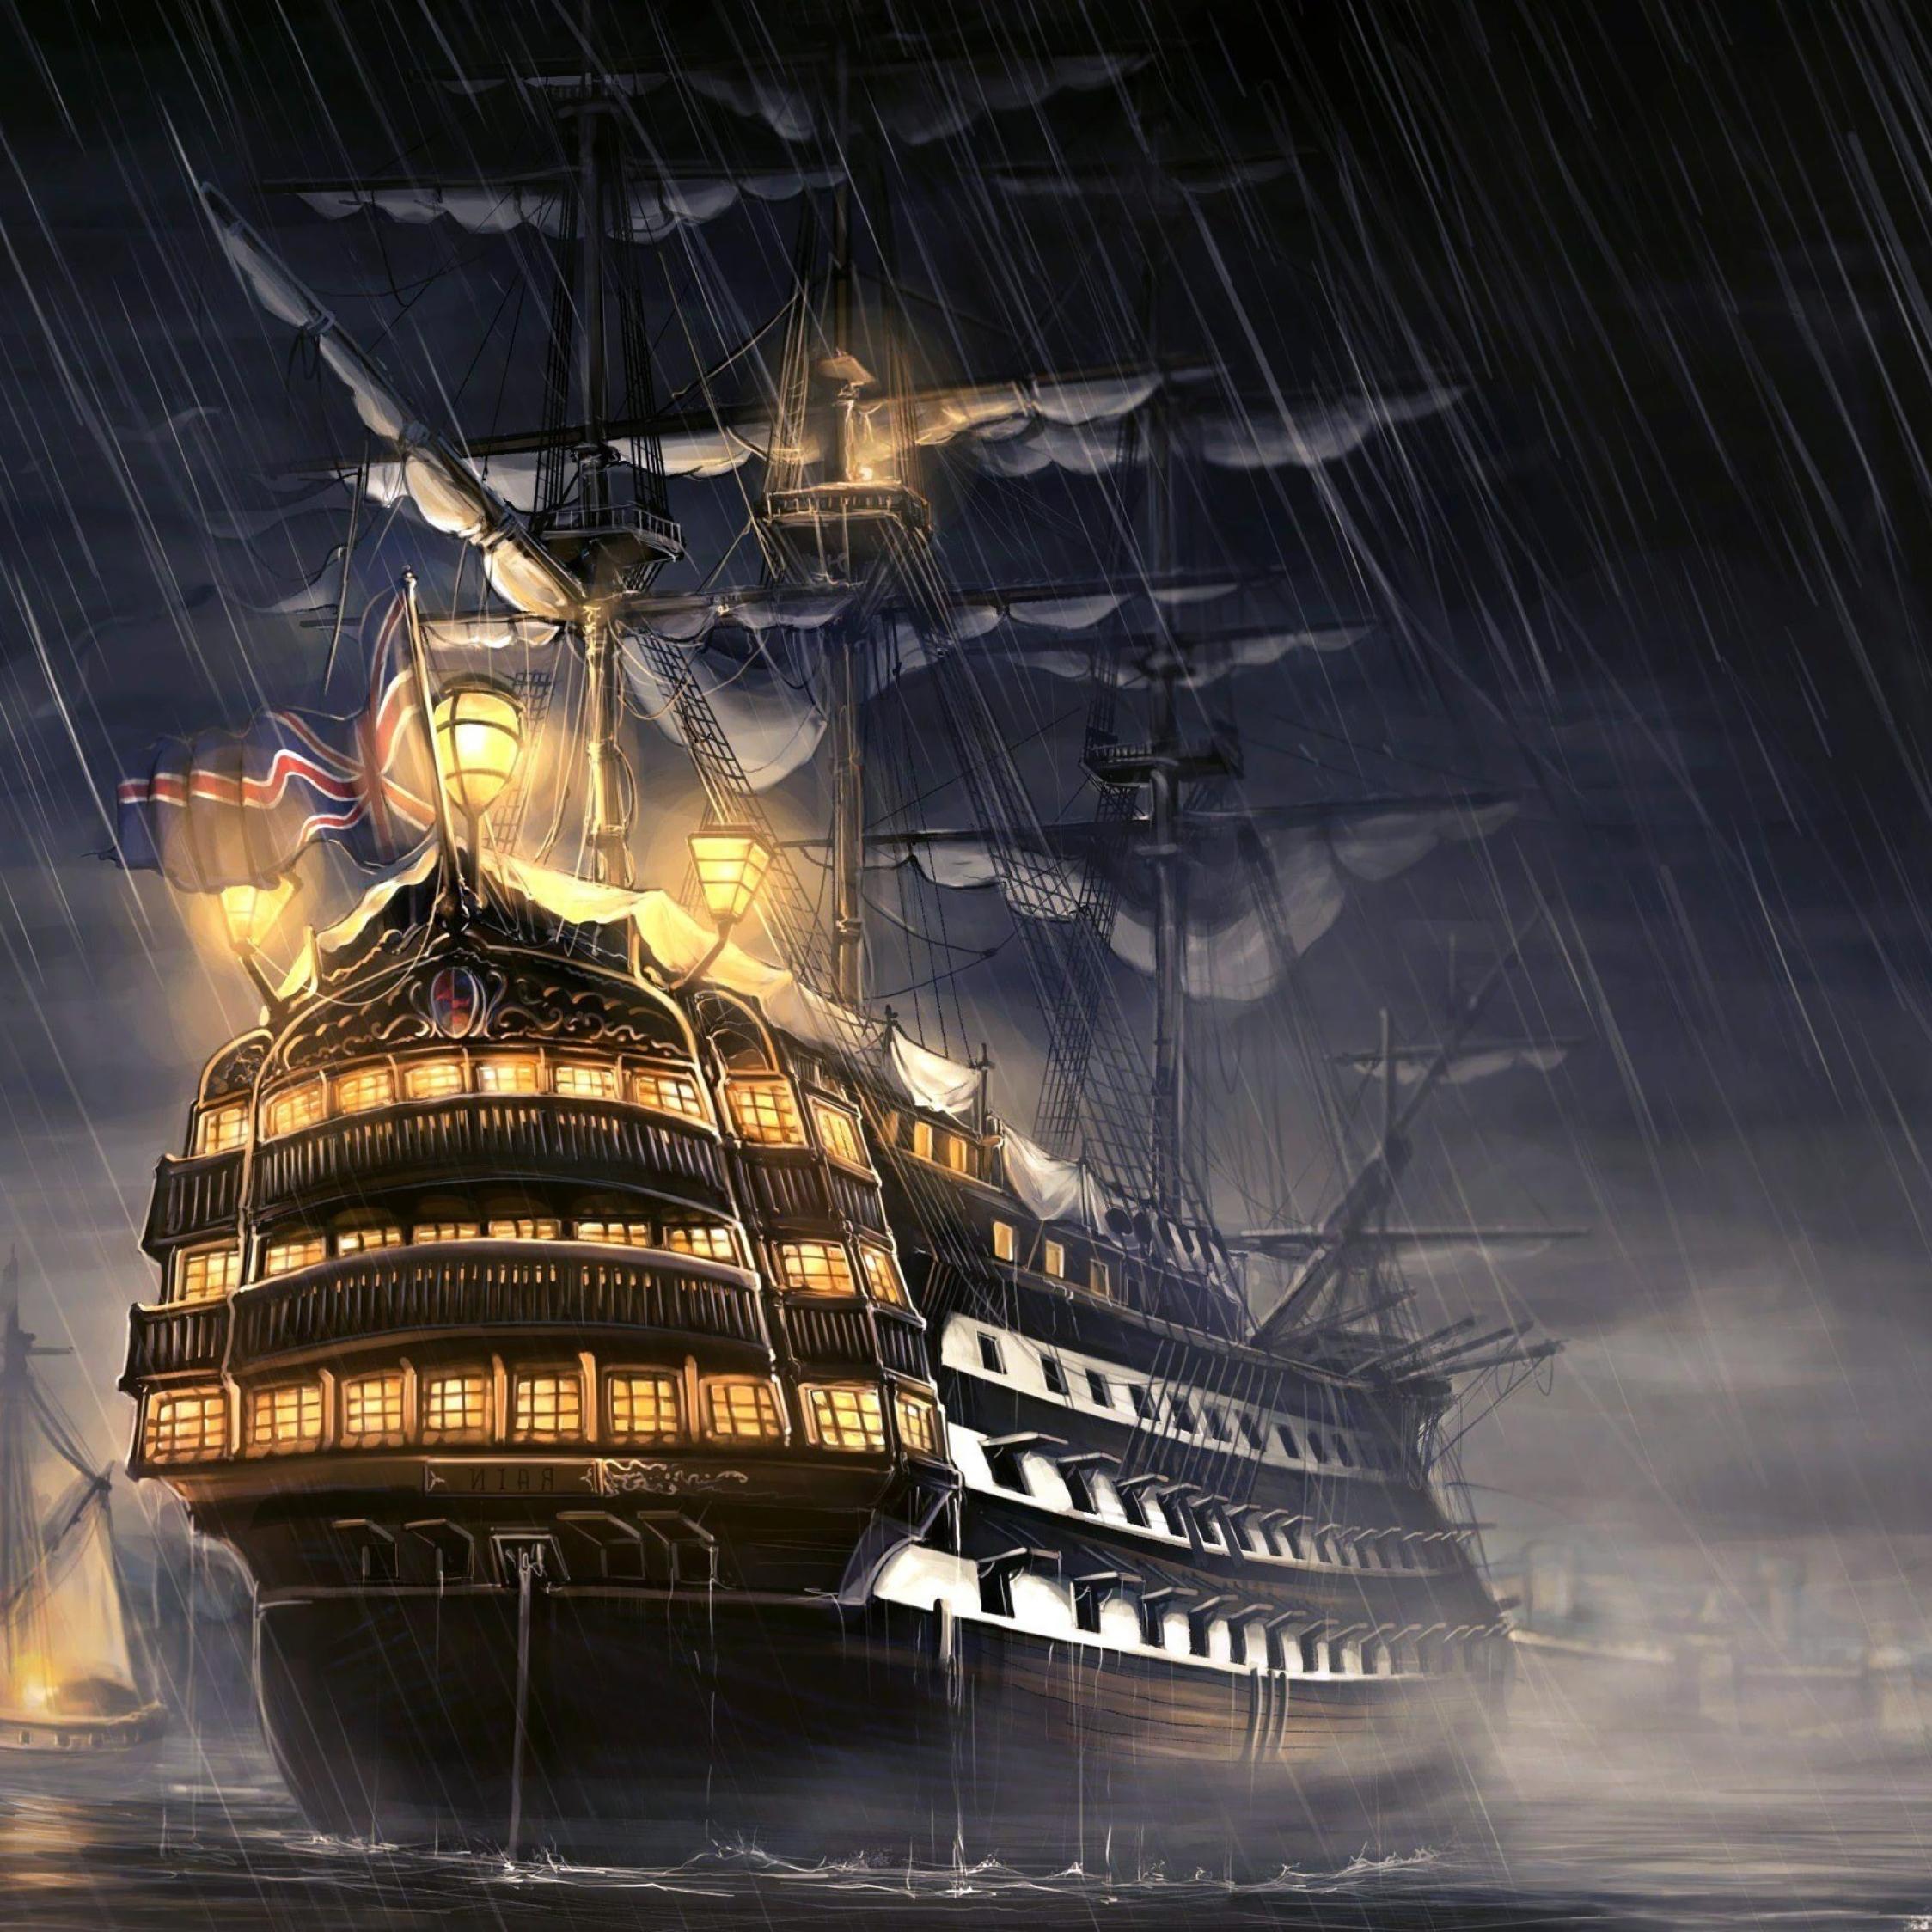 Pirates Of The Caribbean Wallpaper Hd: Pirates Of The Caribbean Ship Artwork, Full HD 2K Wallpaper